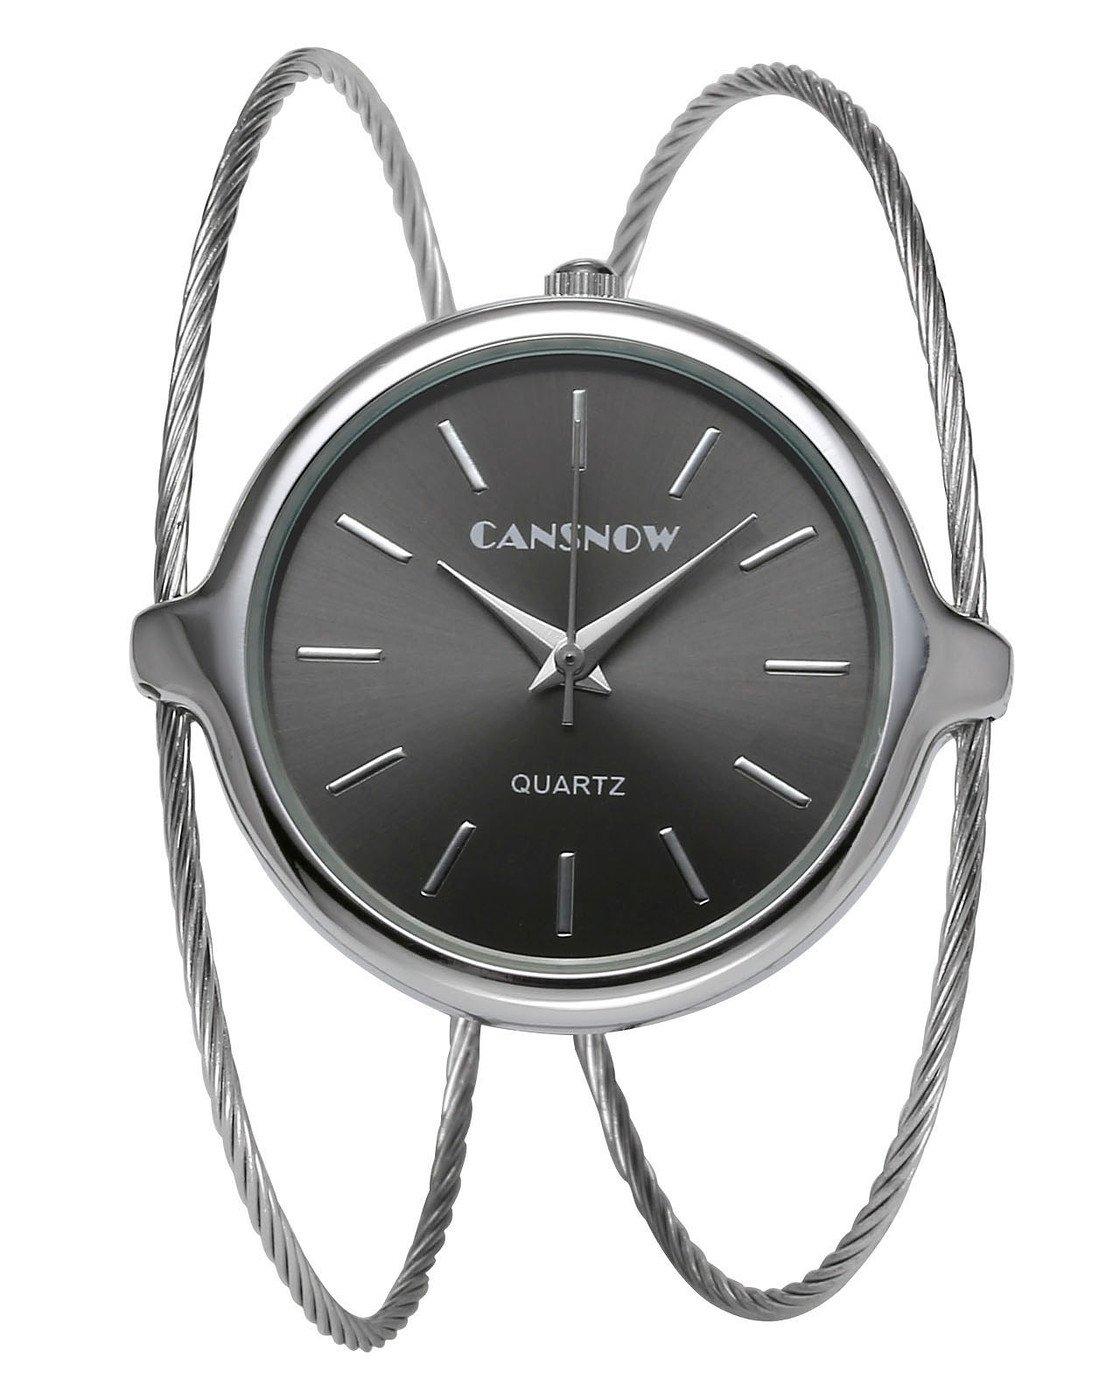 Top Plaza Womens Fashion Casual Silver Tone Analog Quartz Bangle Cuff Bracelet Wrist Watch, Unique Elegant Thin Metal Band Big Face Watches for Small Wrist(Black Dial)